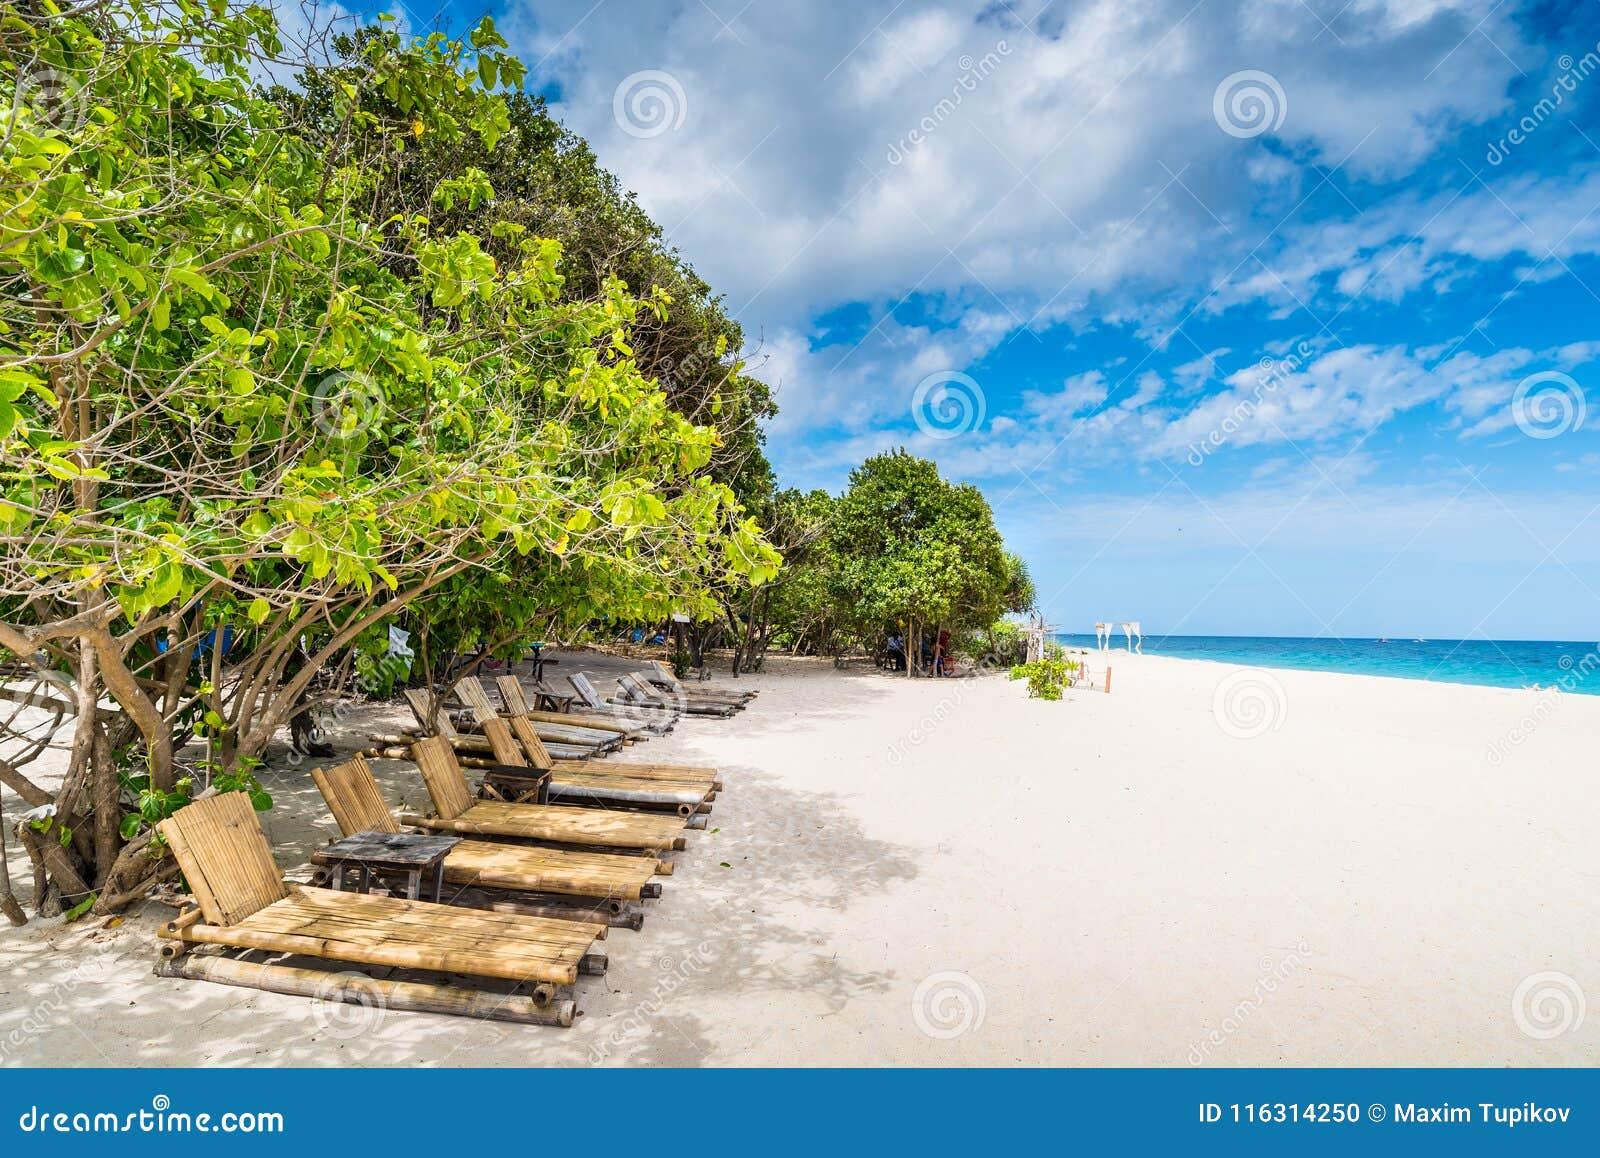 Tropical beach background from Puka Beach at Boracay island